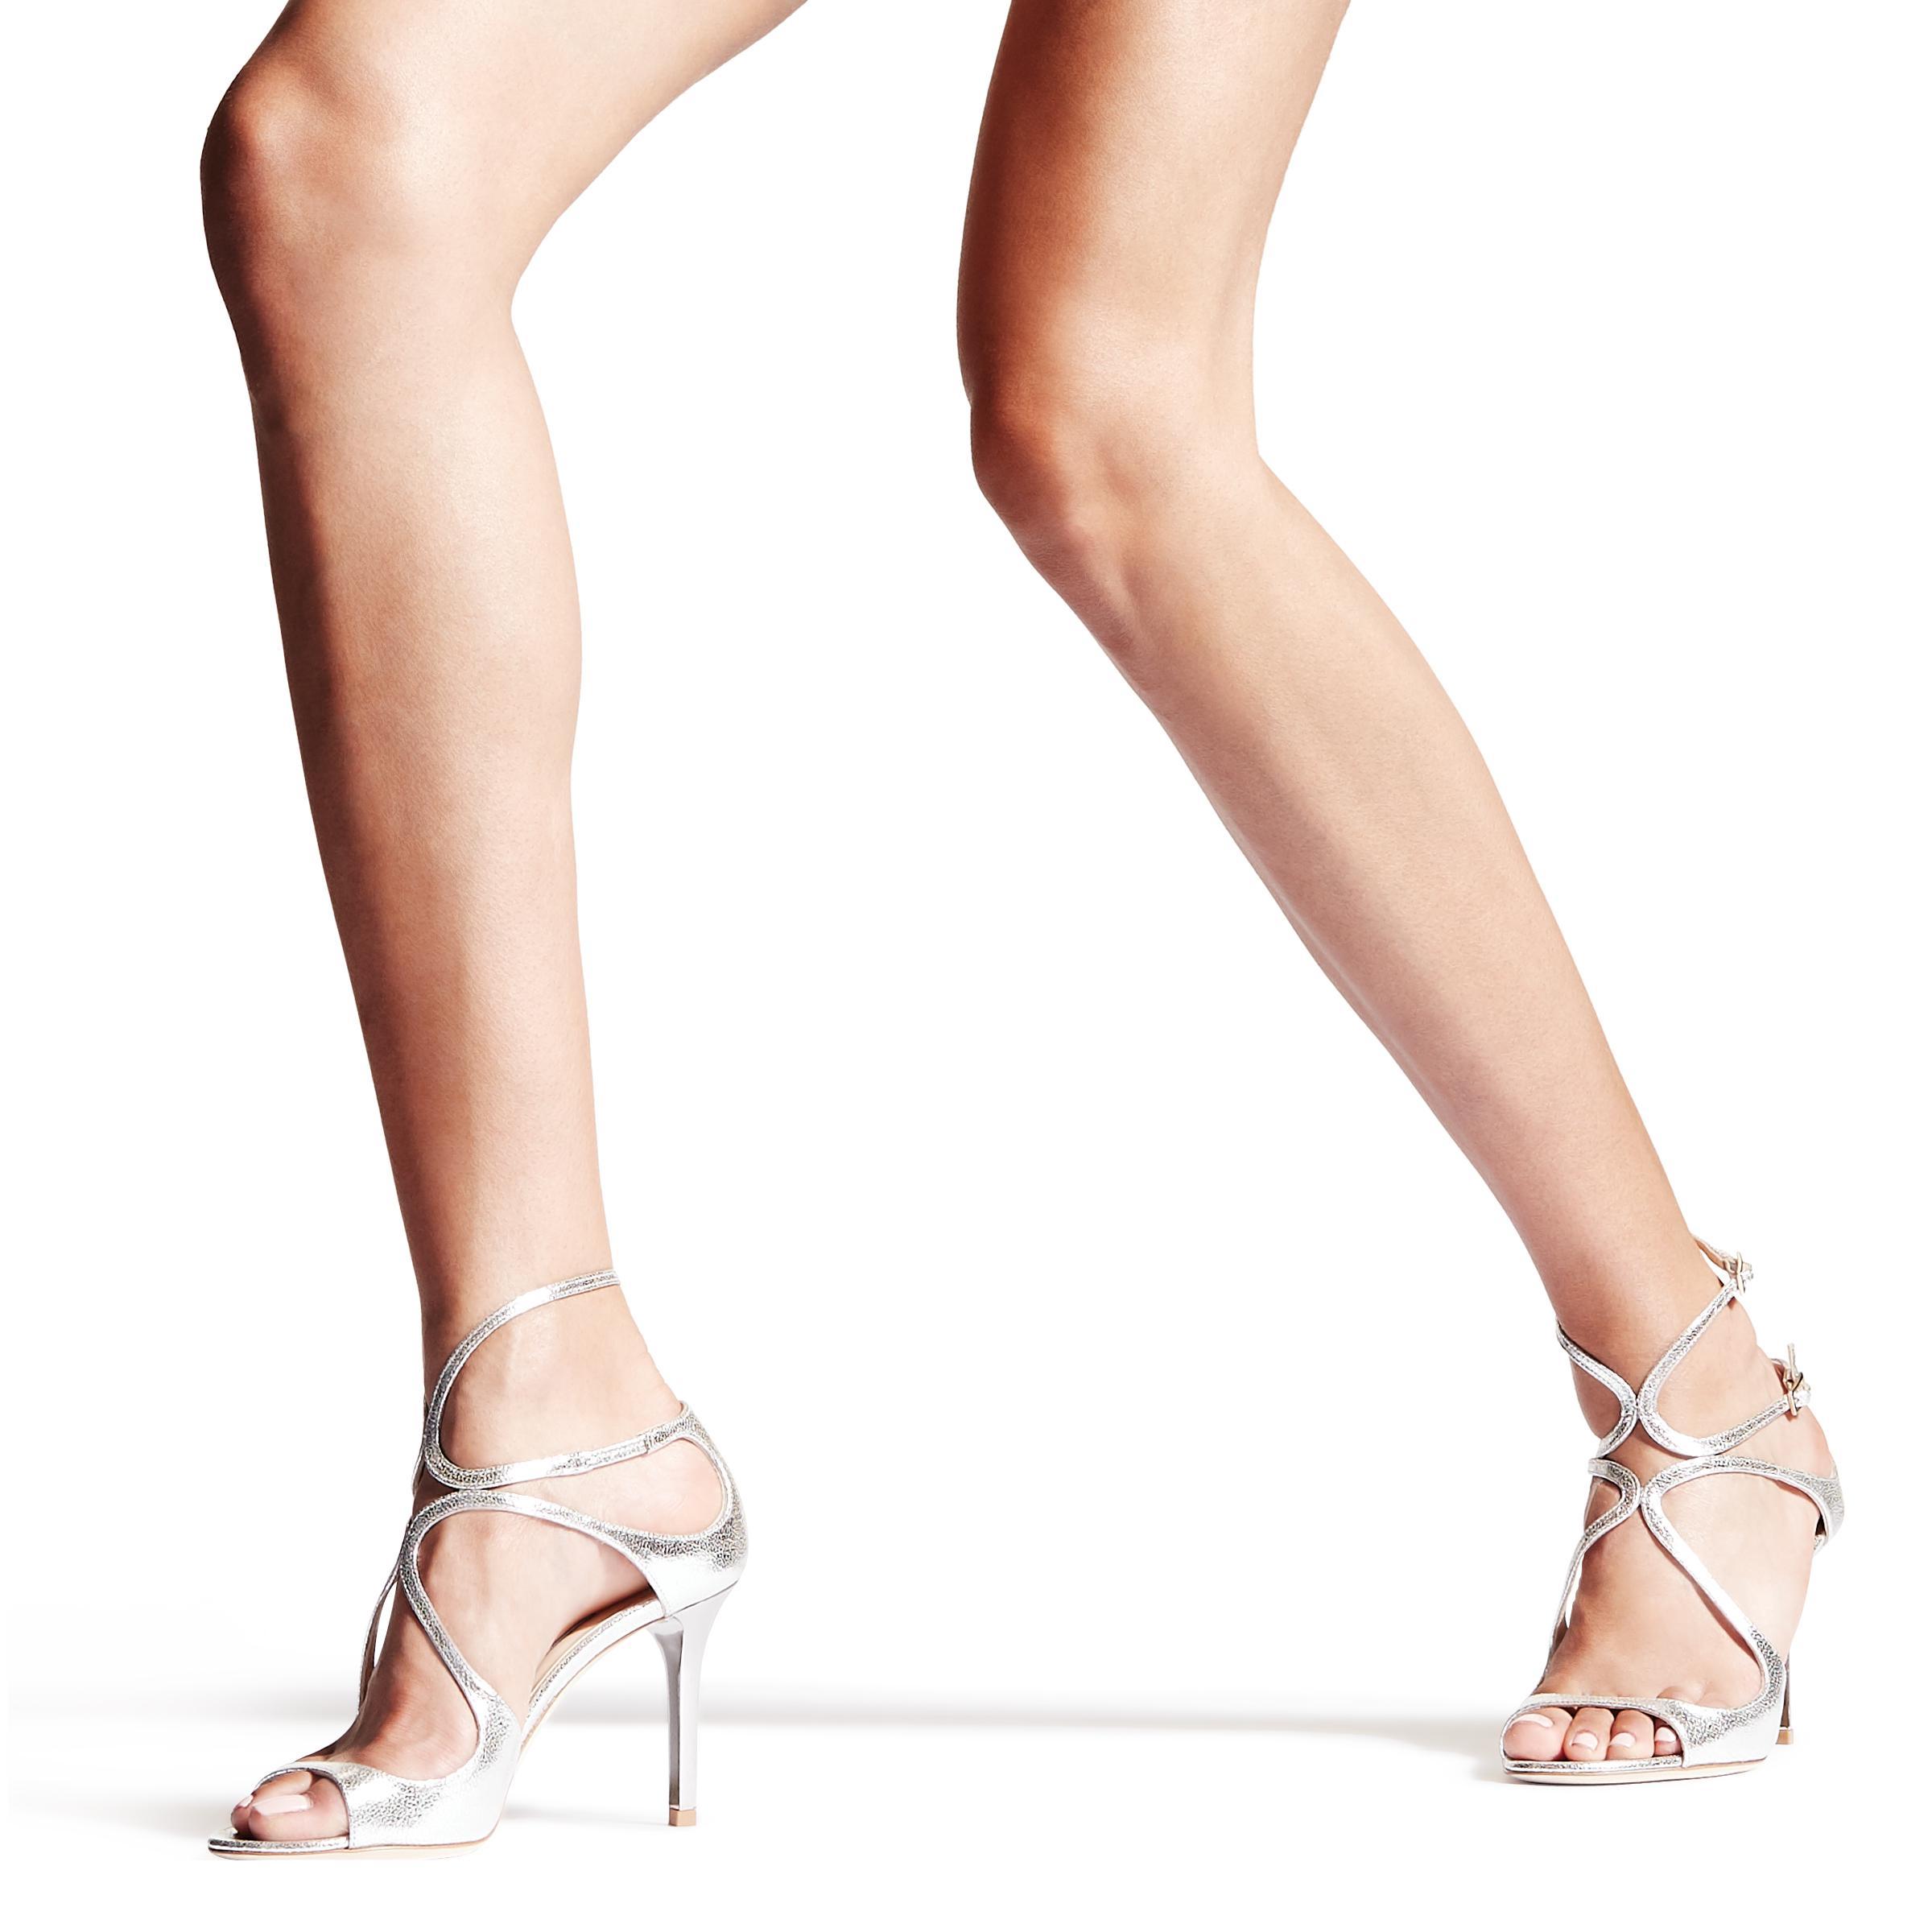 d891cd9e628f Jimmy Choo - Metallic Ivette Champagne Glitter Leather Strappy Sandals -  Lyst. View fullscreen